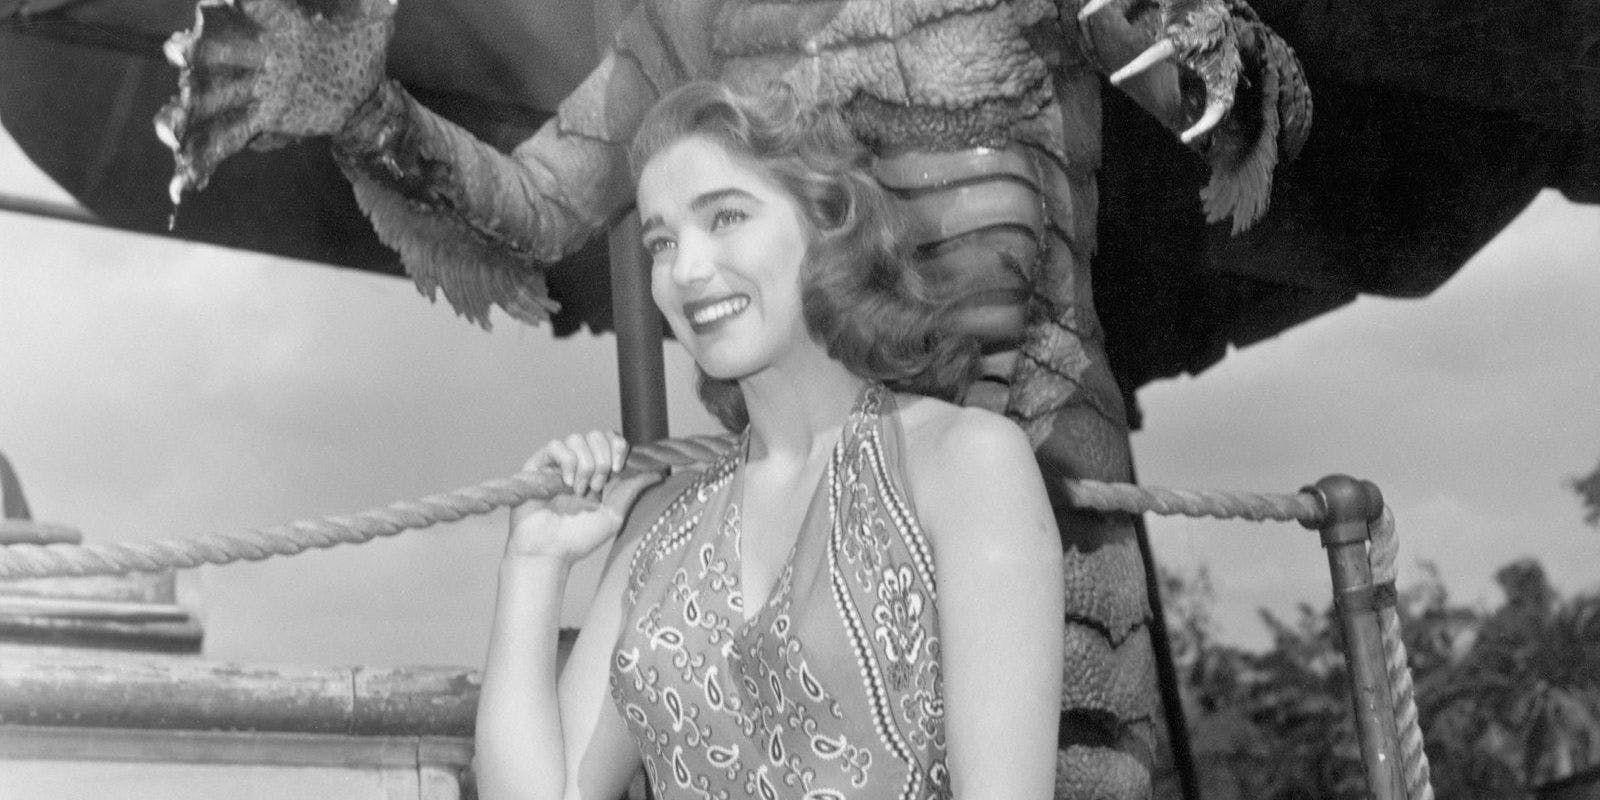 Creature From the Black Lagoon's Julie Adams Dies At Age 92 | CBR